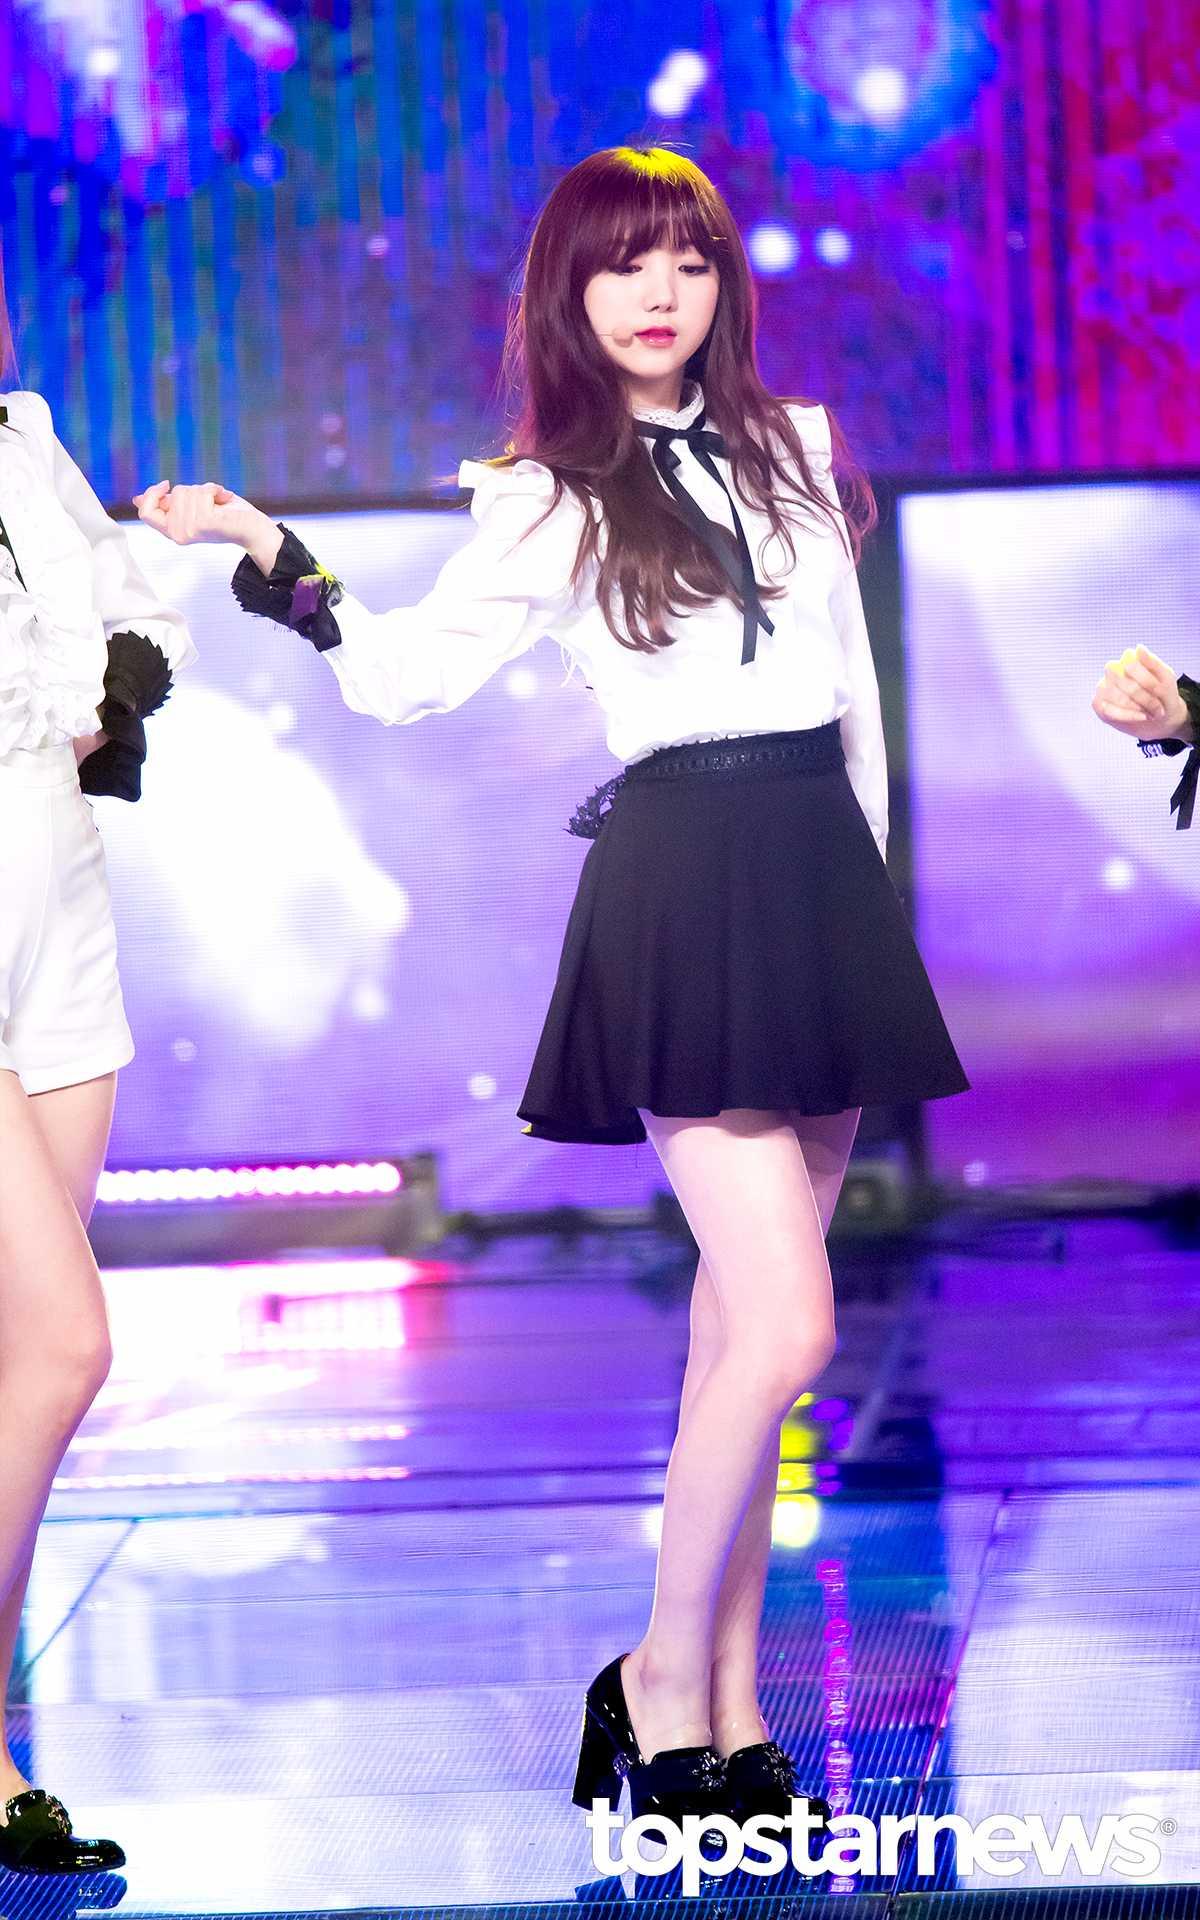 Lovelyz - Kei Sowon、Yu Jin和Kei就是韓國演藝圈的三大鳥仔腳女偶像啊XD